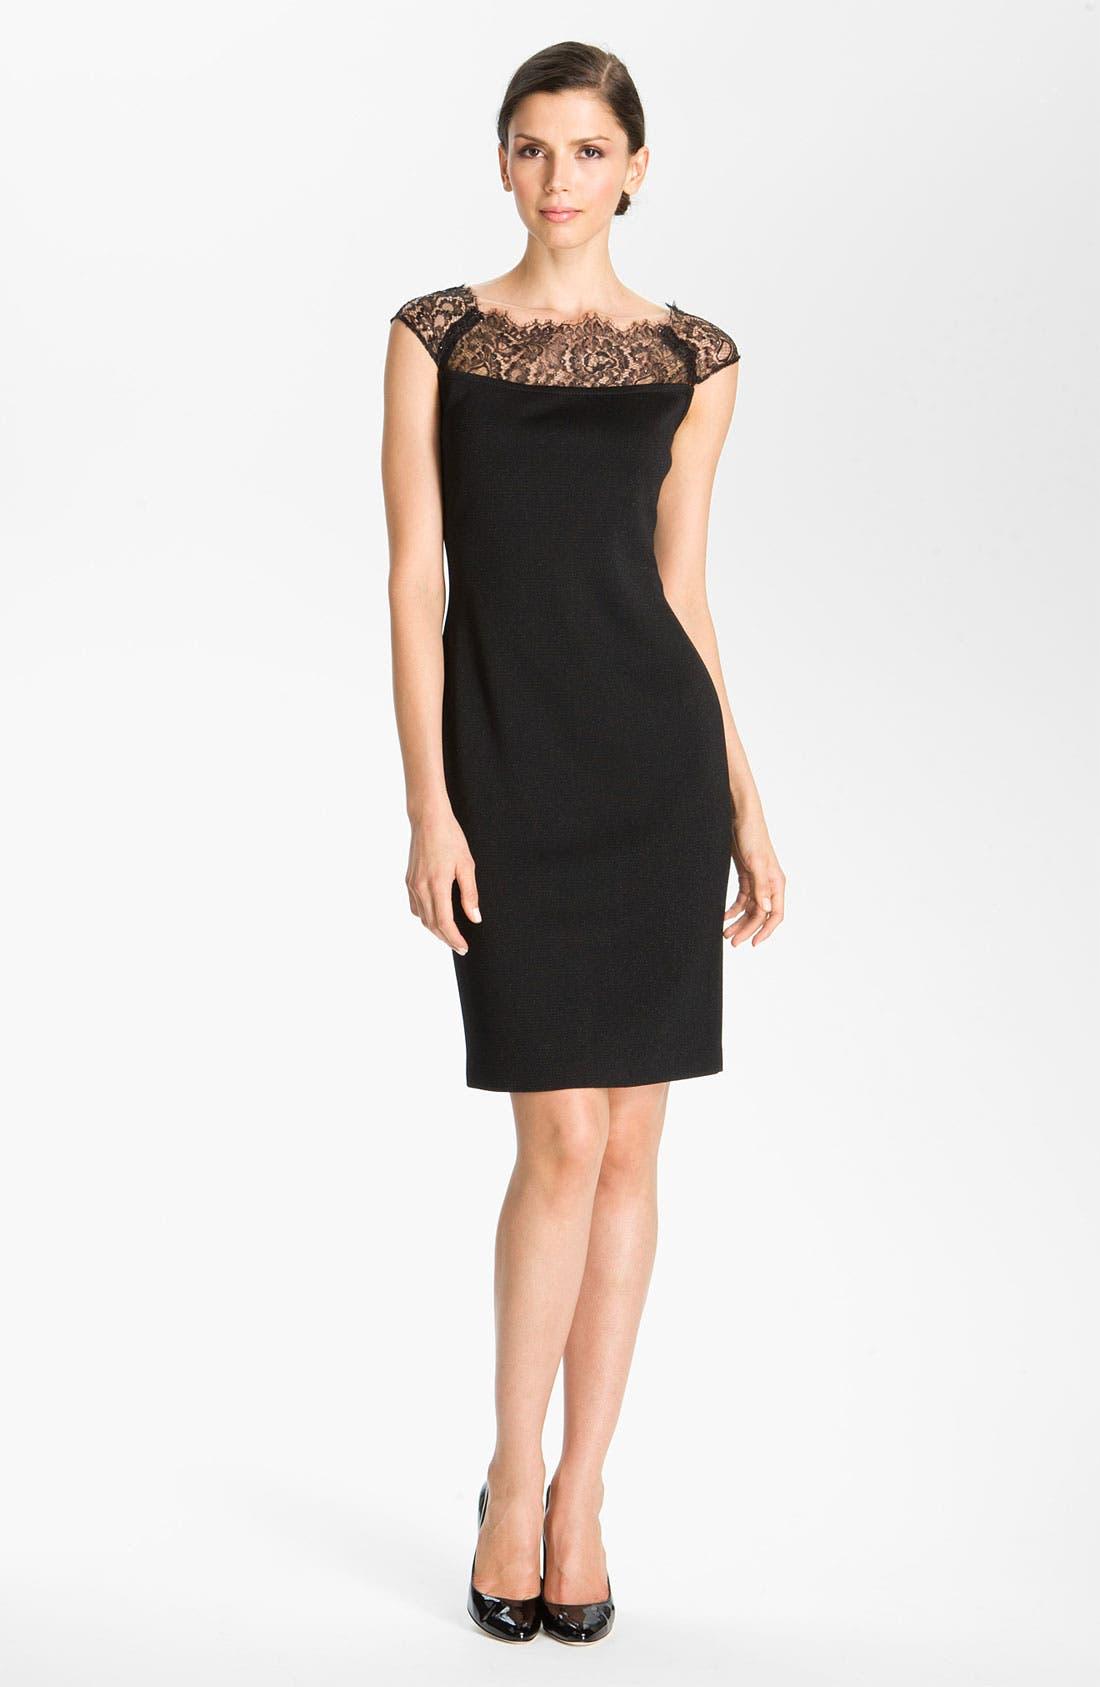 Alternate Image 1 Selected - St. John Collection Shimmer Milano Knit Dress